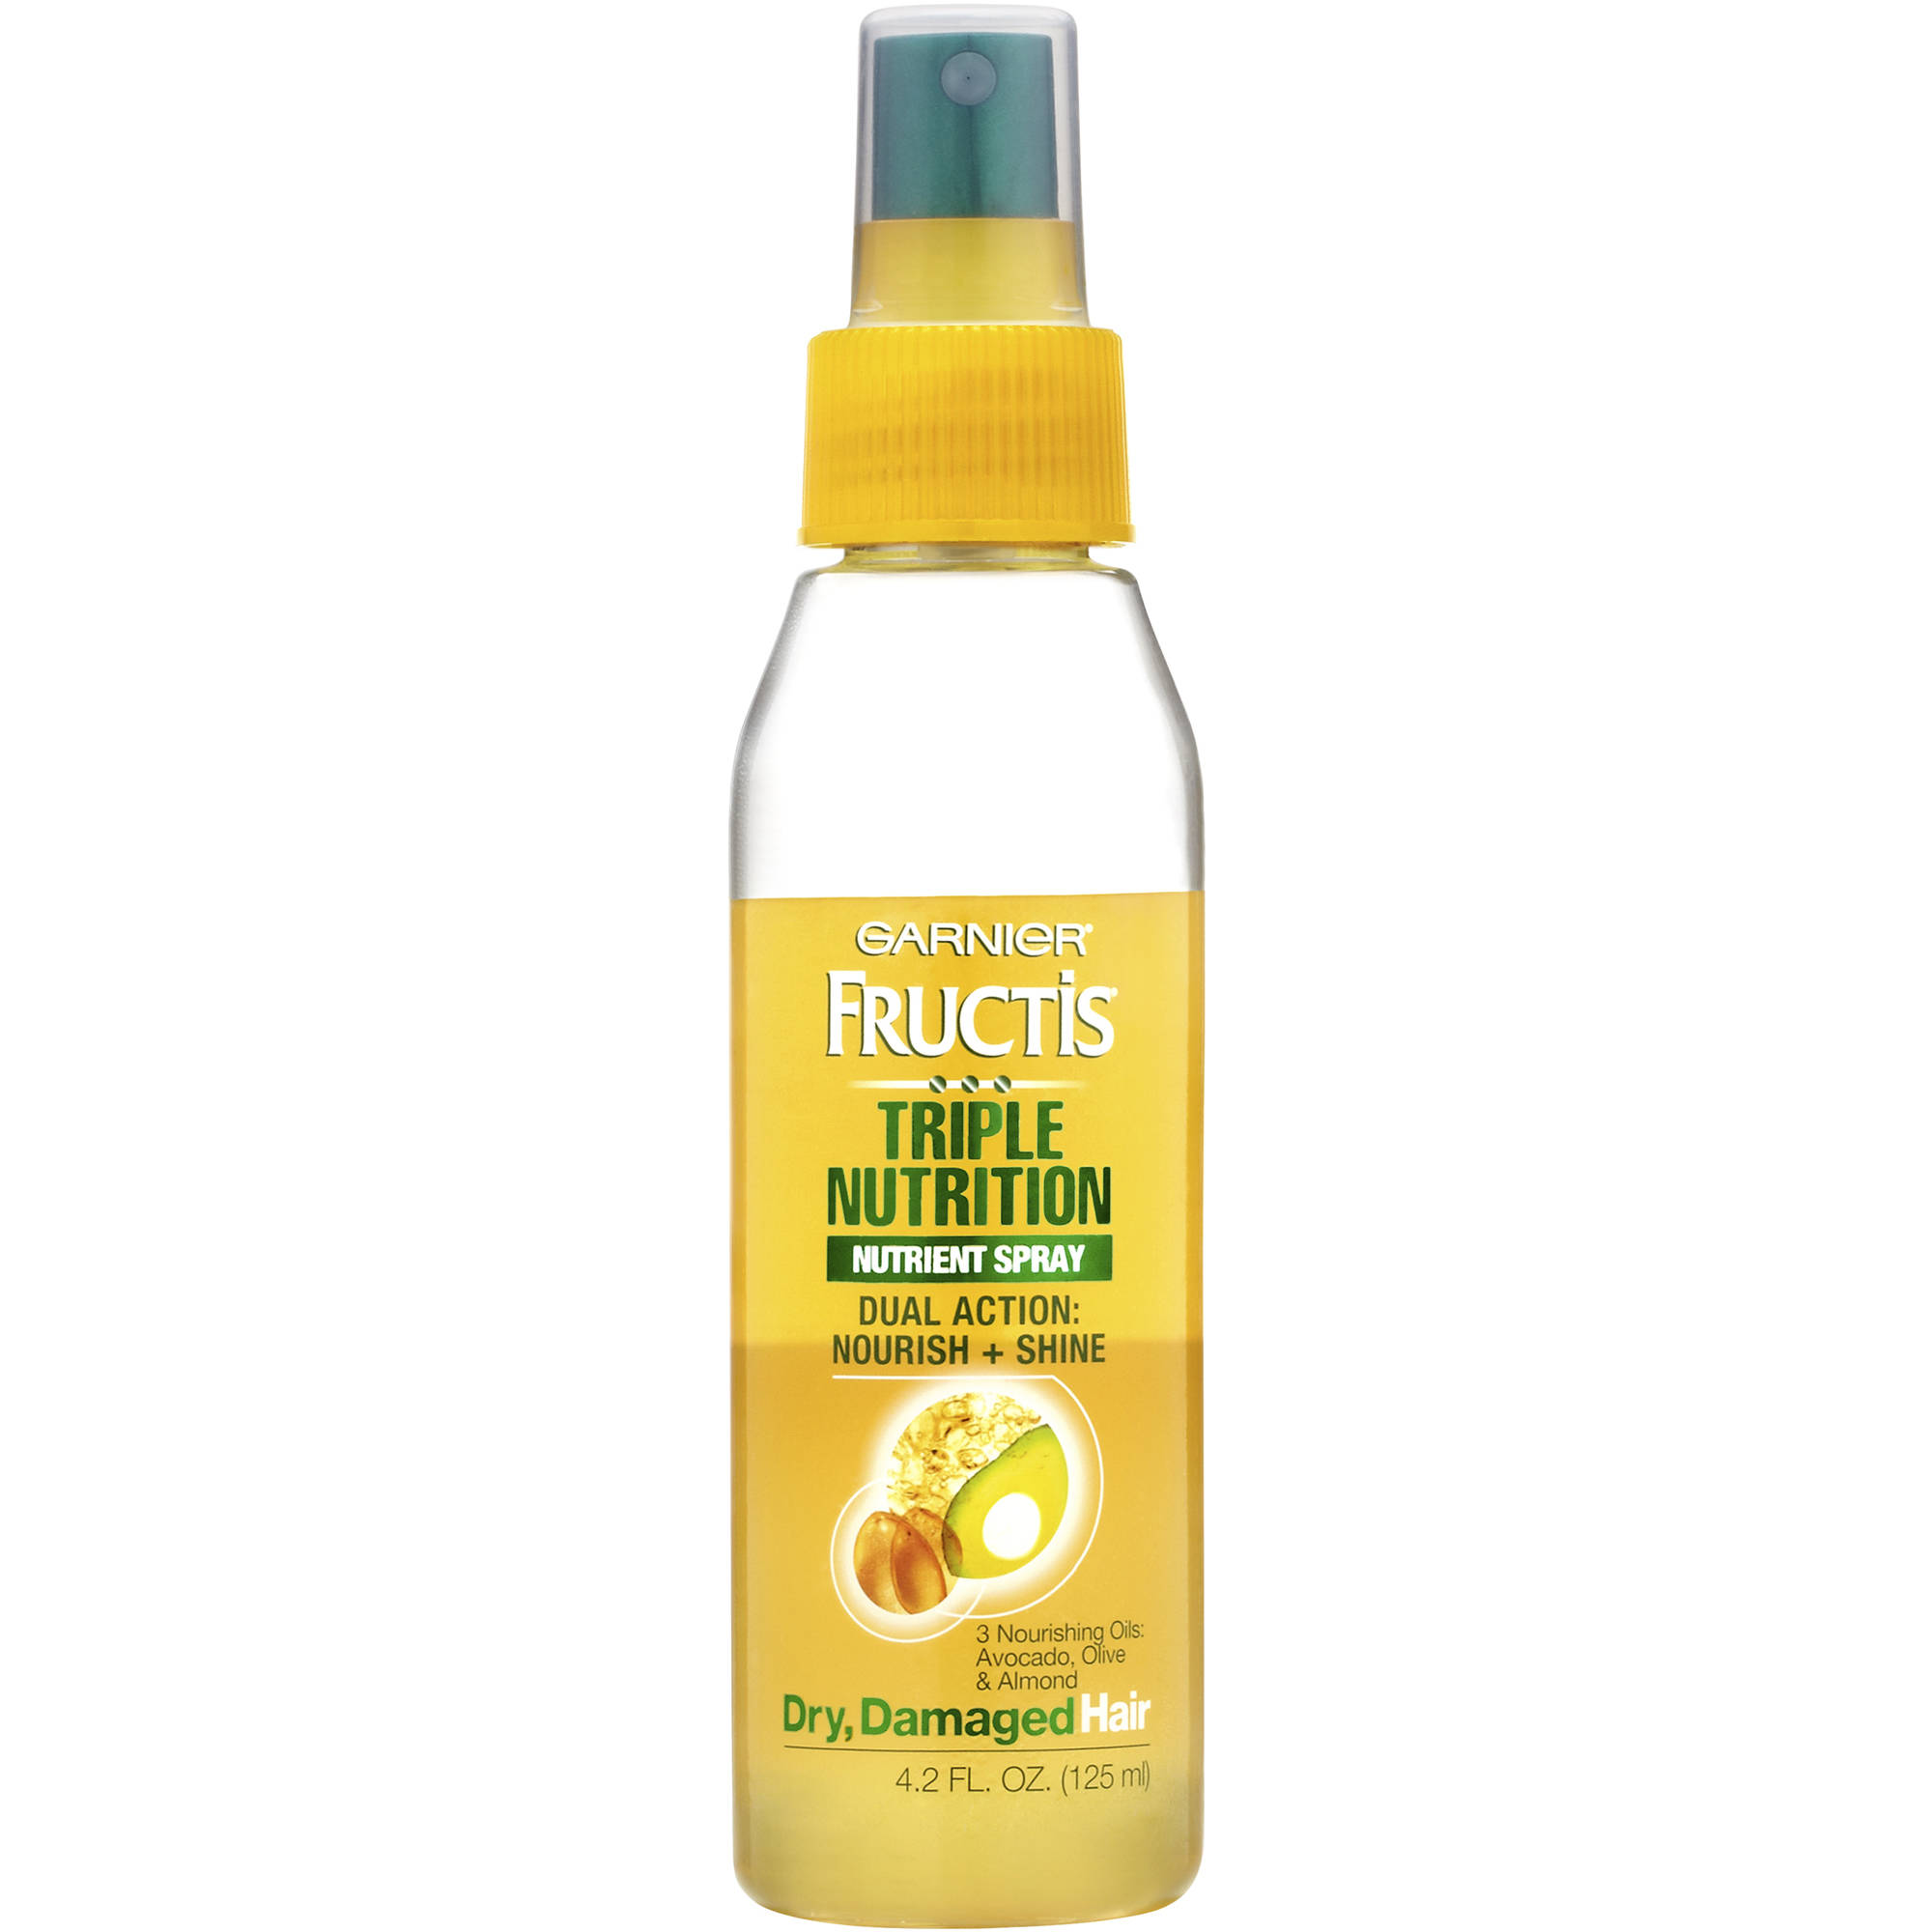 Garnier Fructis Triple Nutrition Nutrient Spray for Dry, Damaged Hair, 4.2 fl oz